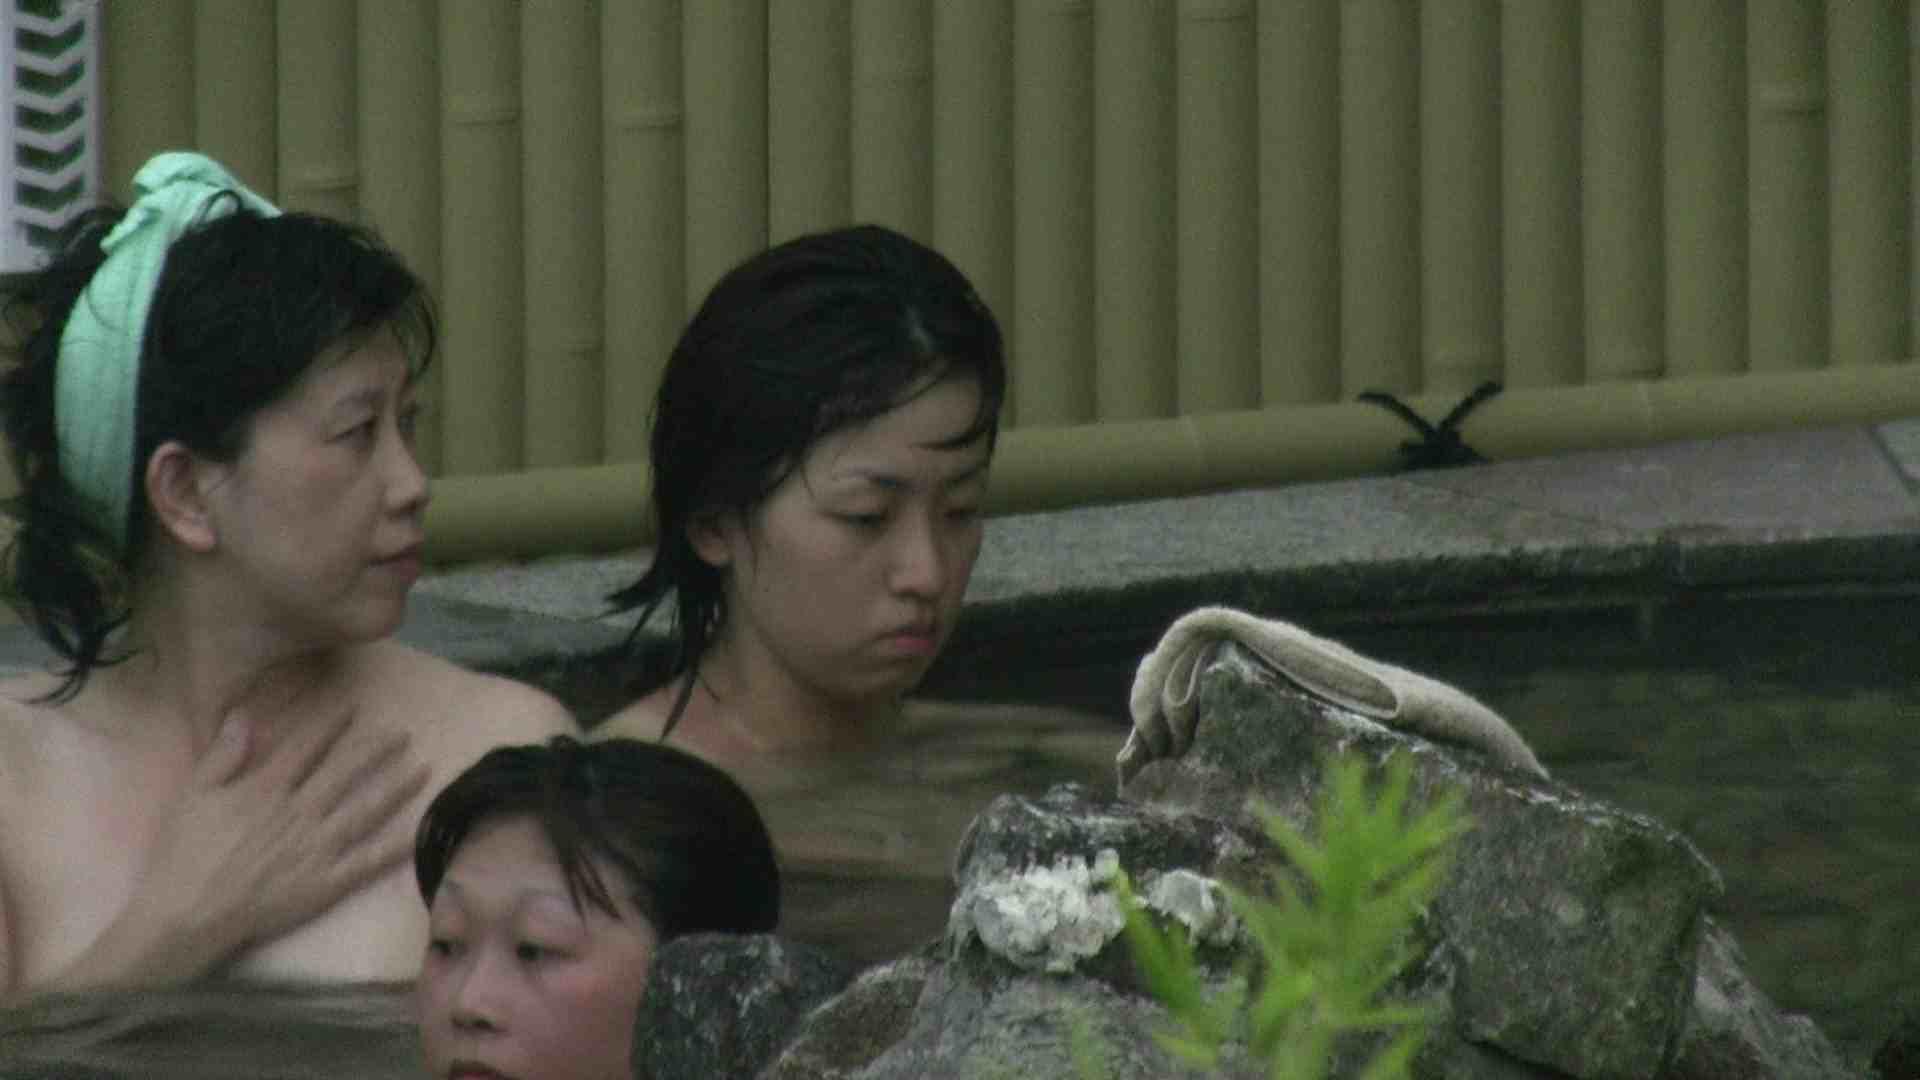 Aquaな露天風呂Vol.170 0  65連発 4